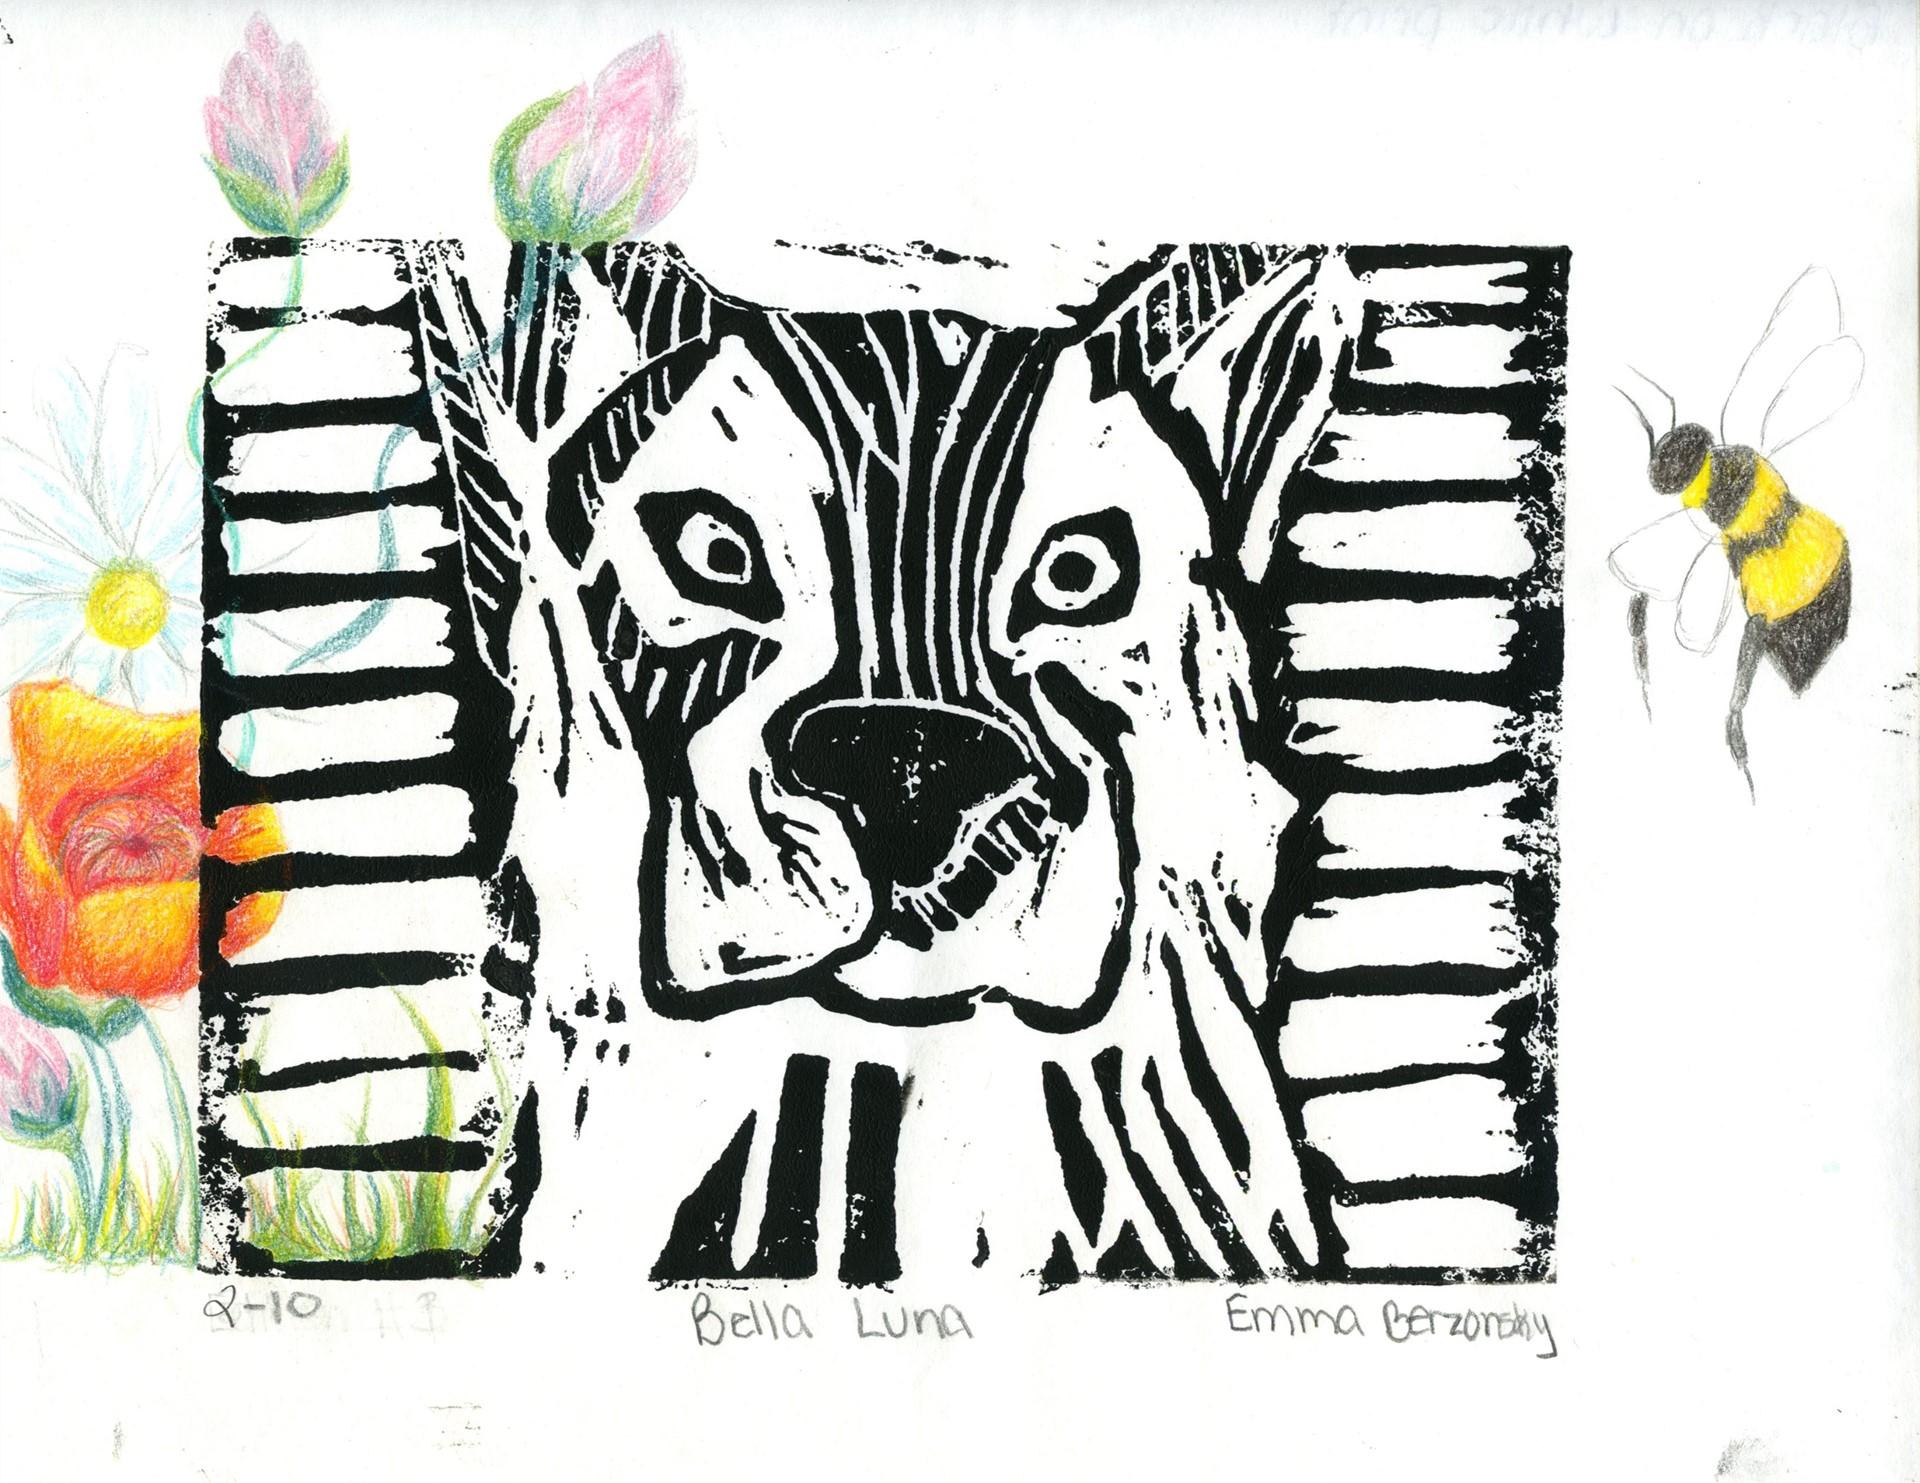 Emma Berzonsky Grade 9